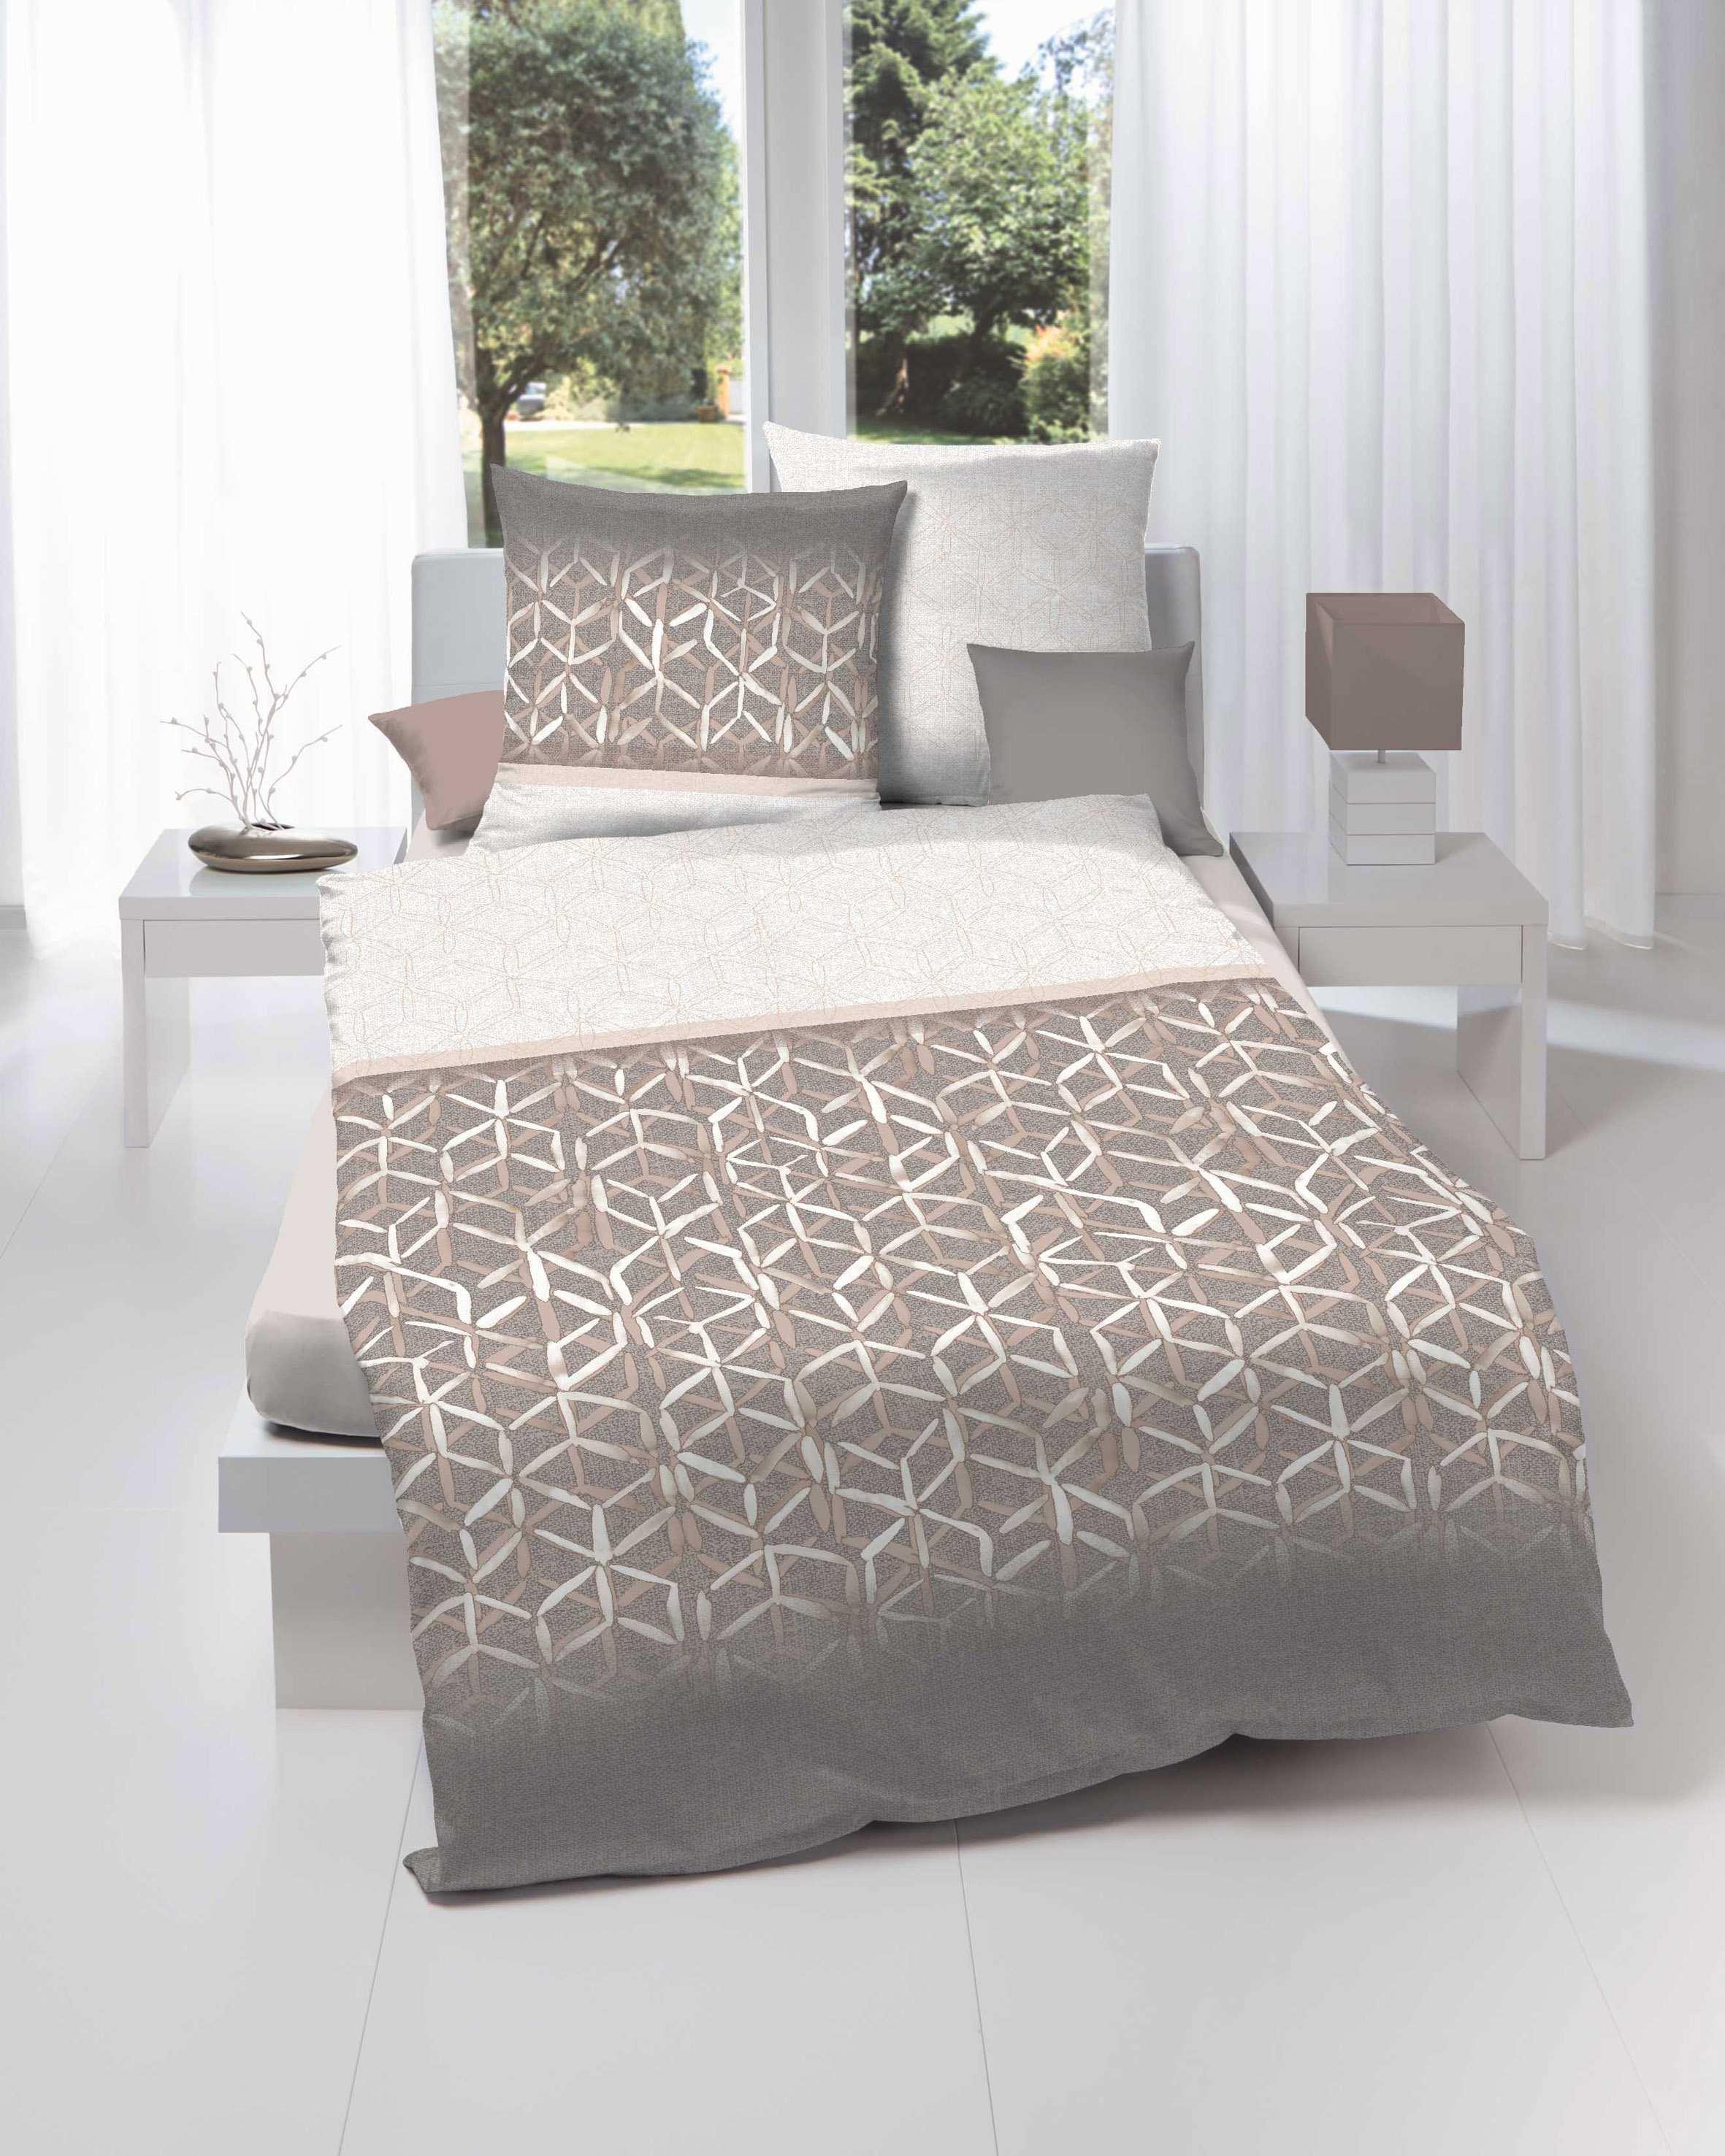 mako satin bettw sche kaeppel 833 farbton mandel braun g nstig. Black Bedroom Furniture Sets. Home Design Ideas